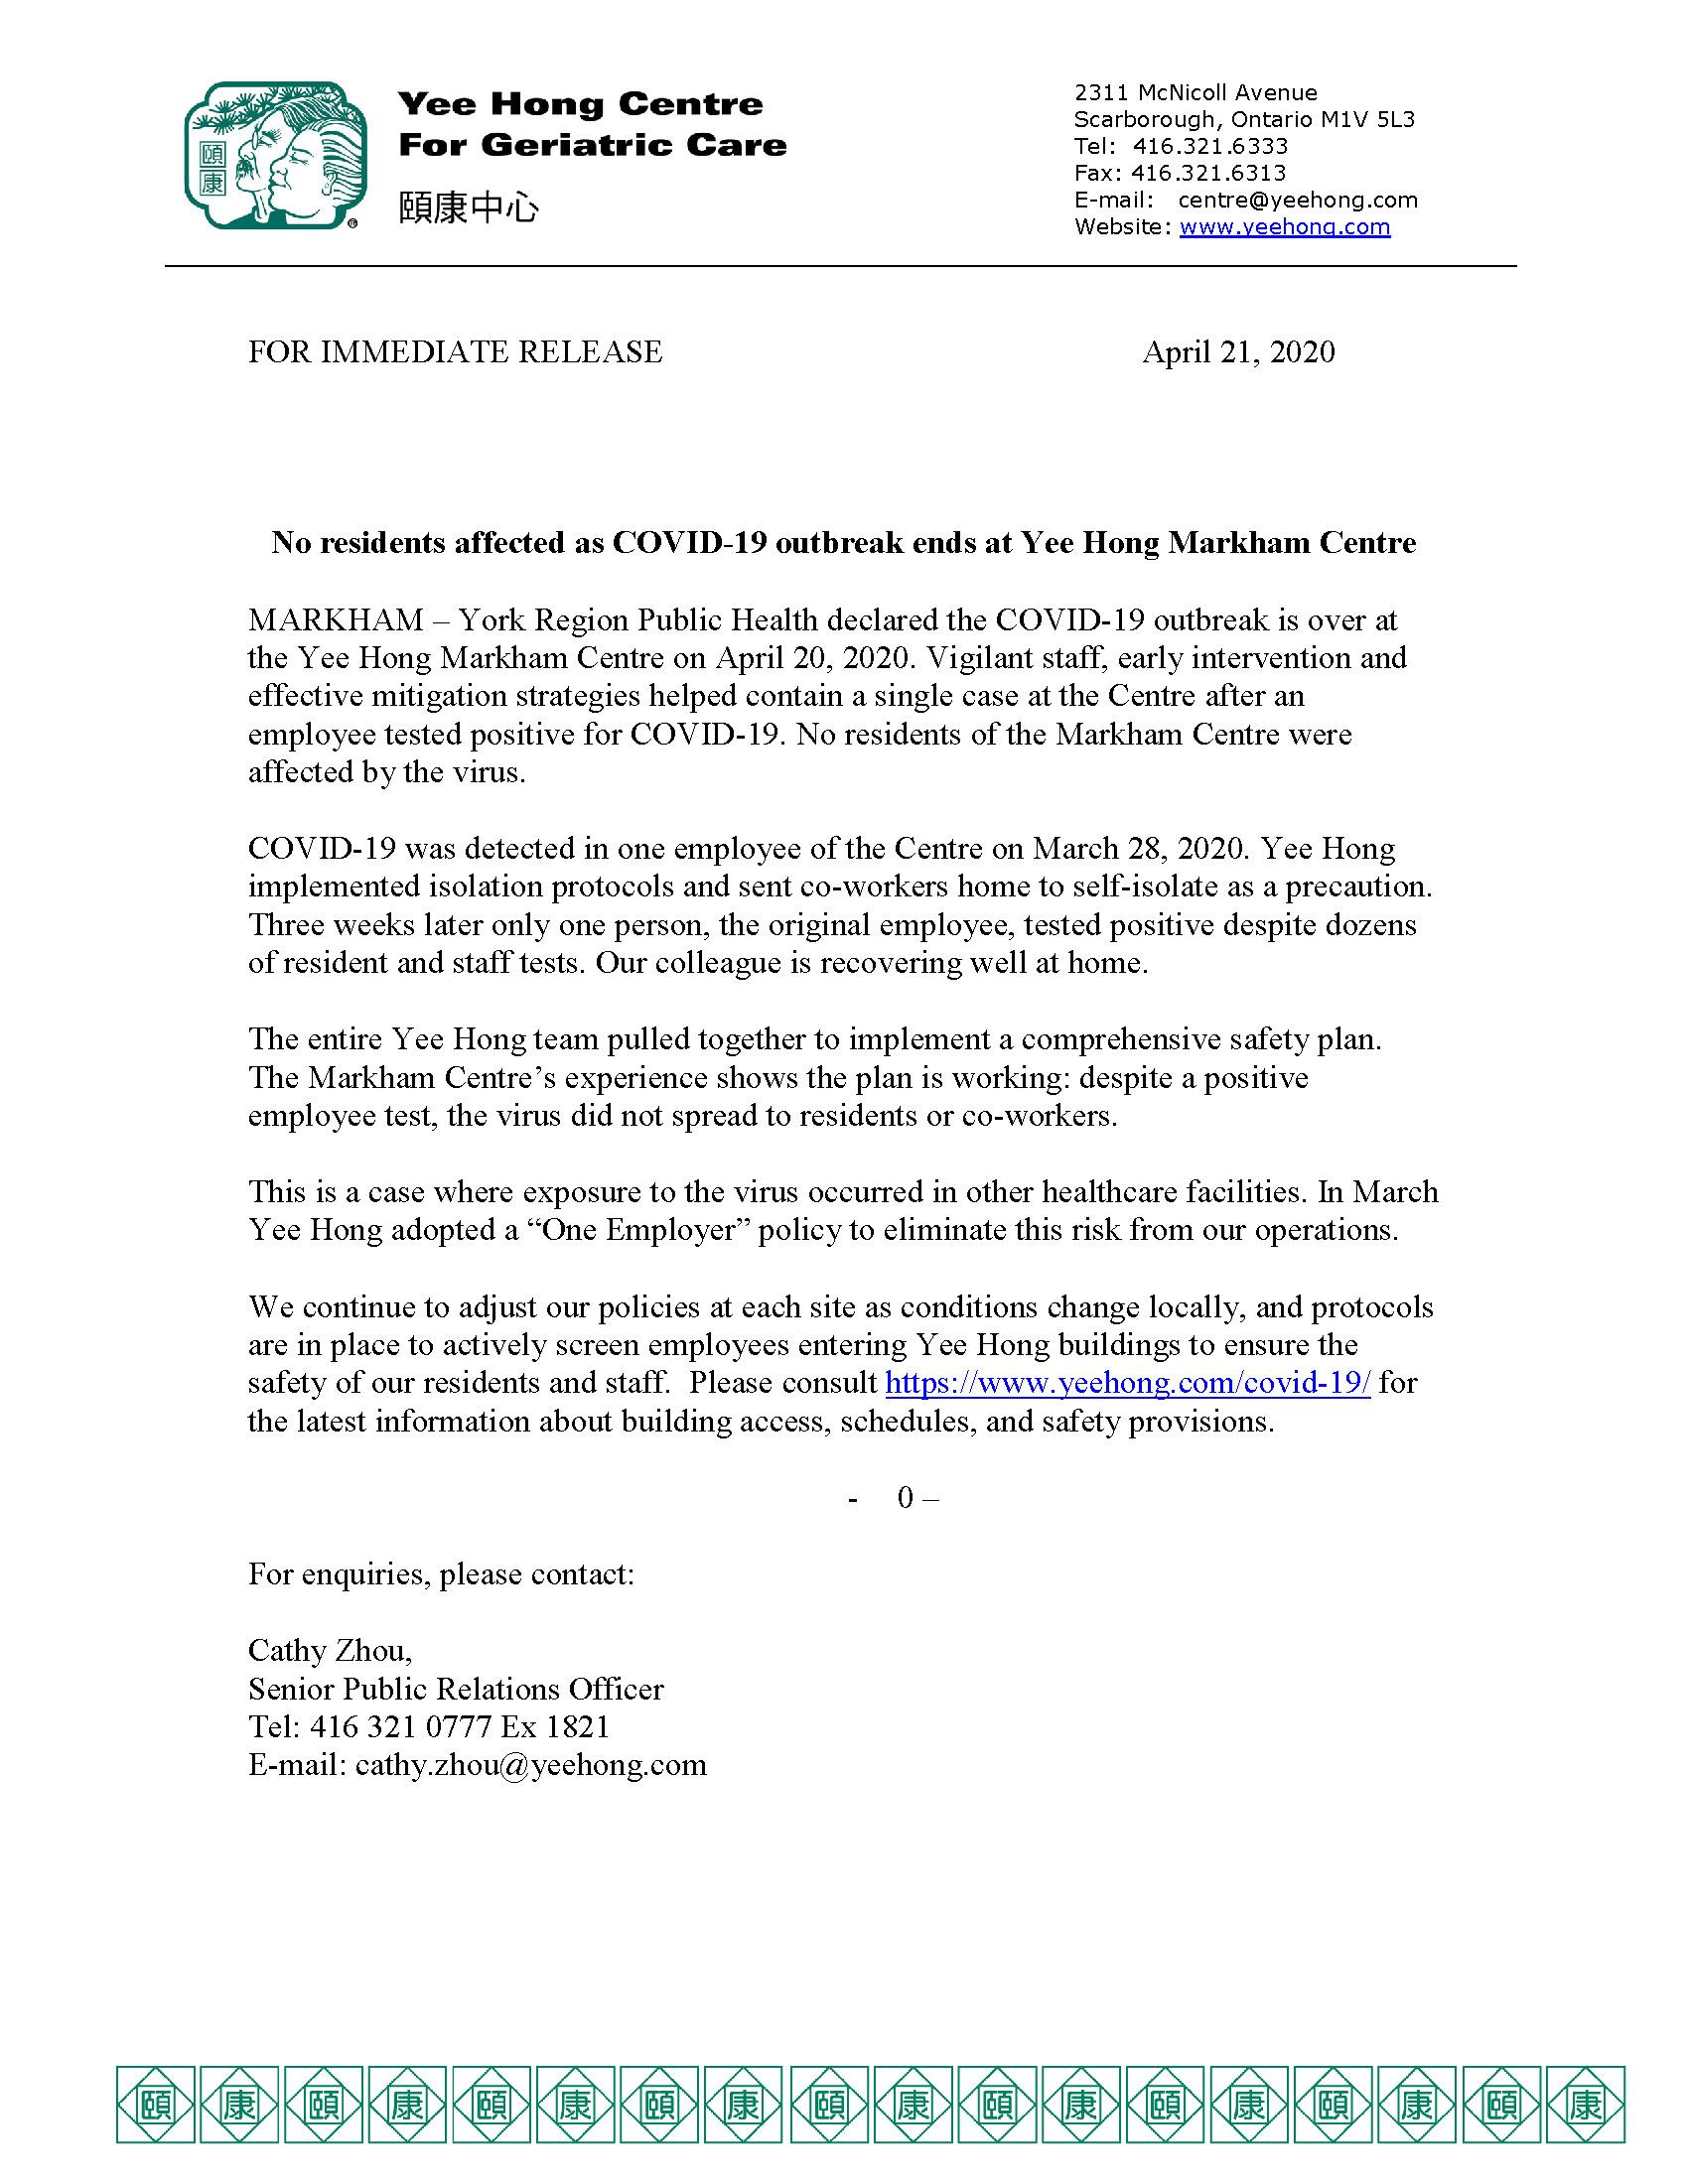 News Release Apr 21, 2020